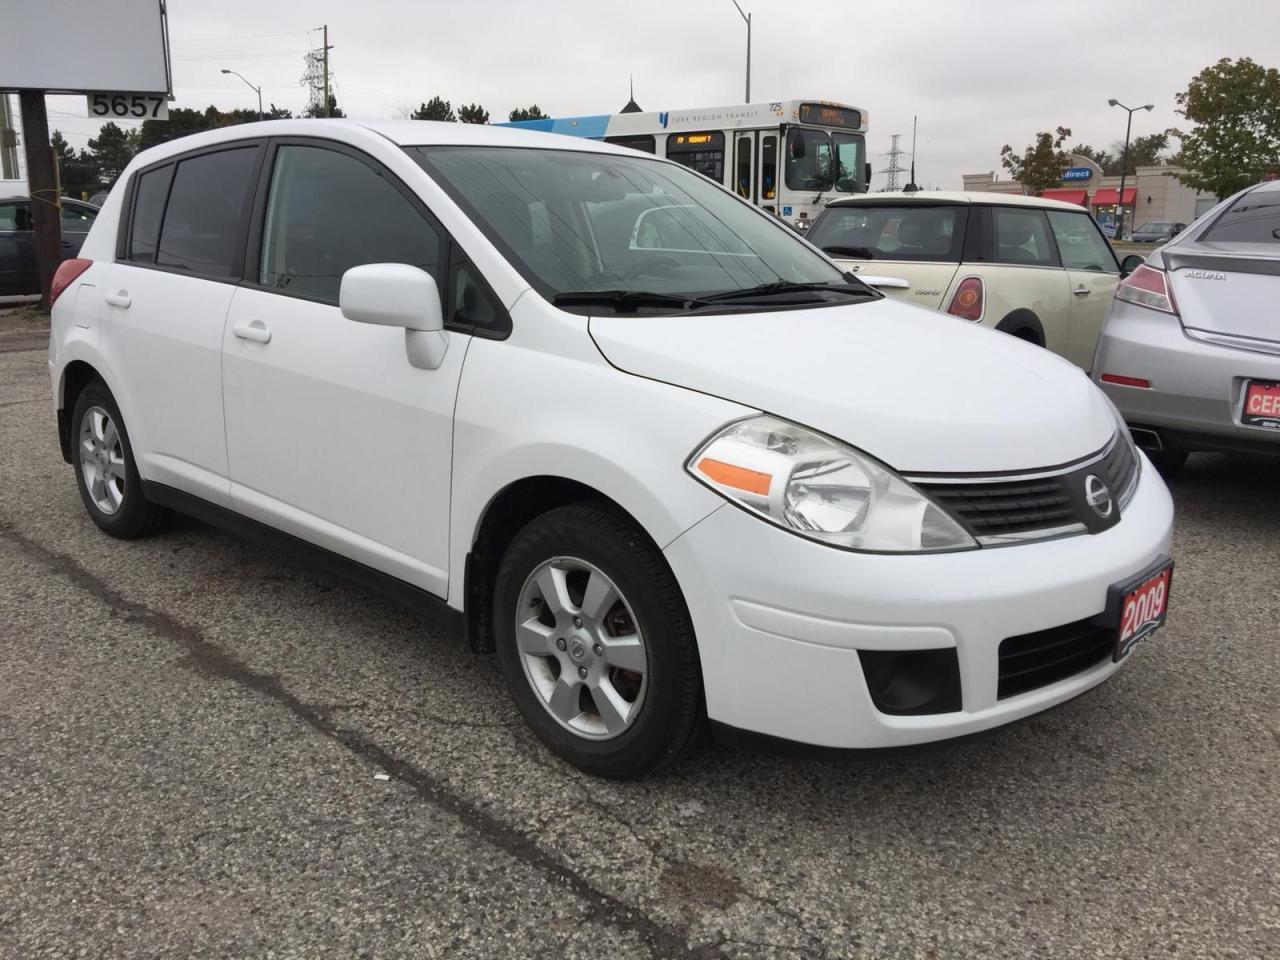 2009 Nissan Versa 1.8 SL FE+, Accident Free, Certified, Warranty